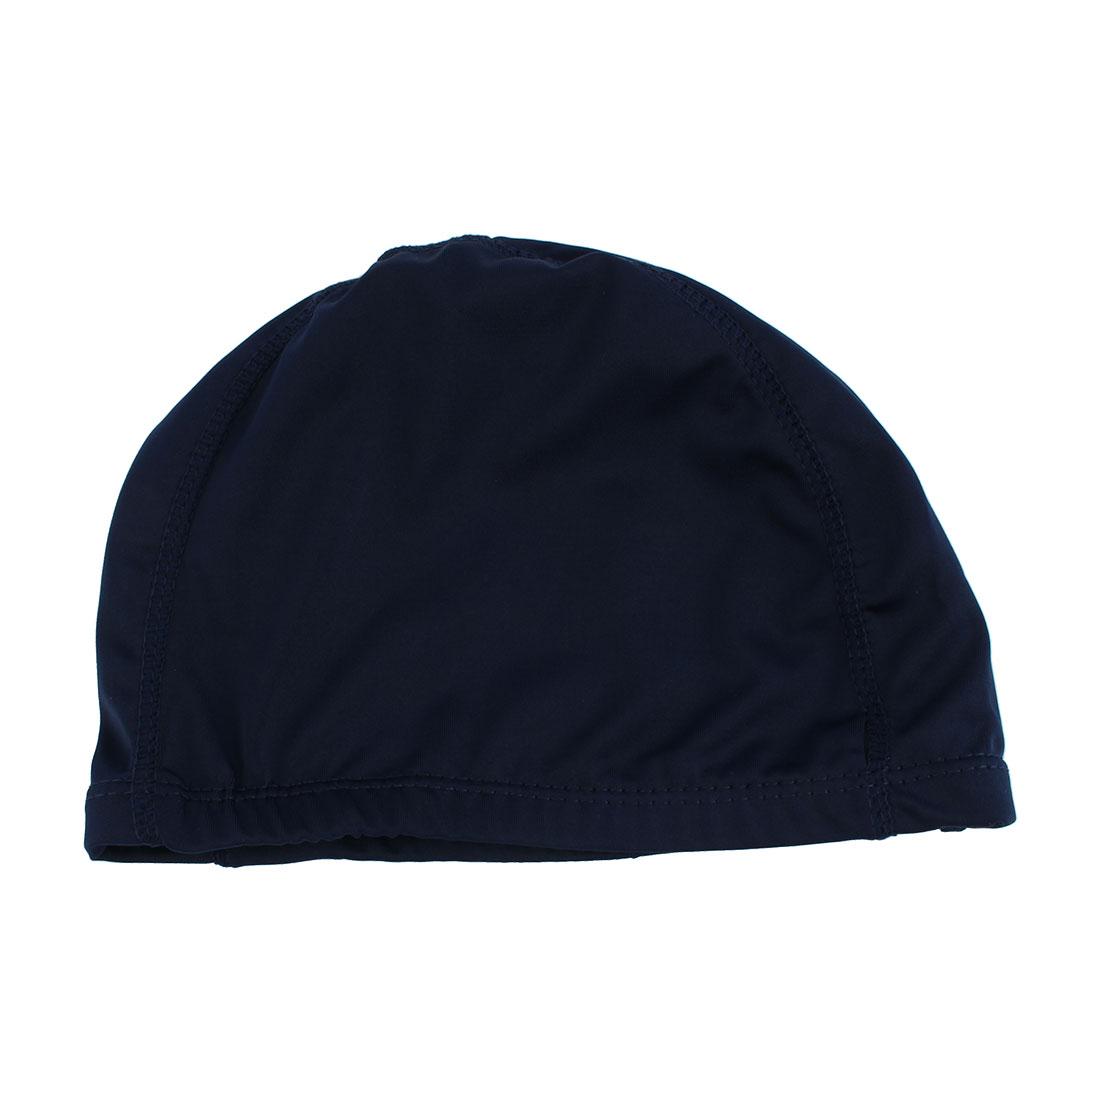 Unique Bargains Dome Shaped Polyester Swimming Cap Hat Navy Blue for Man Woman by Unique-Bargains